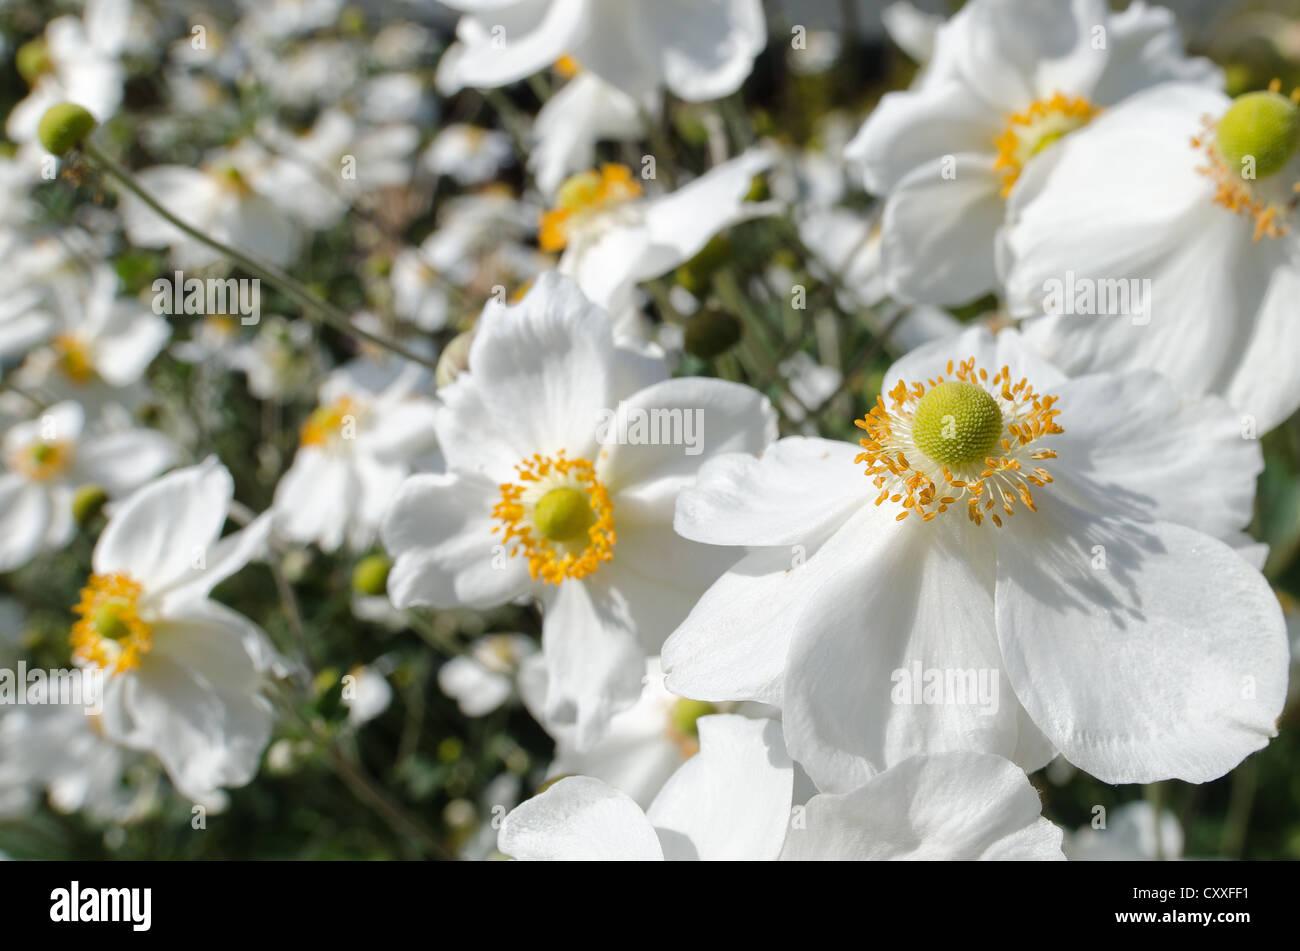 White Japanese Anemone Flower Known As Anemone Hupehensis Mature